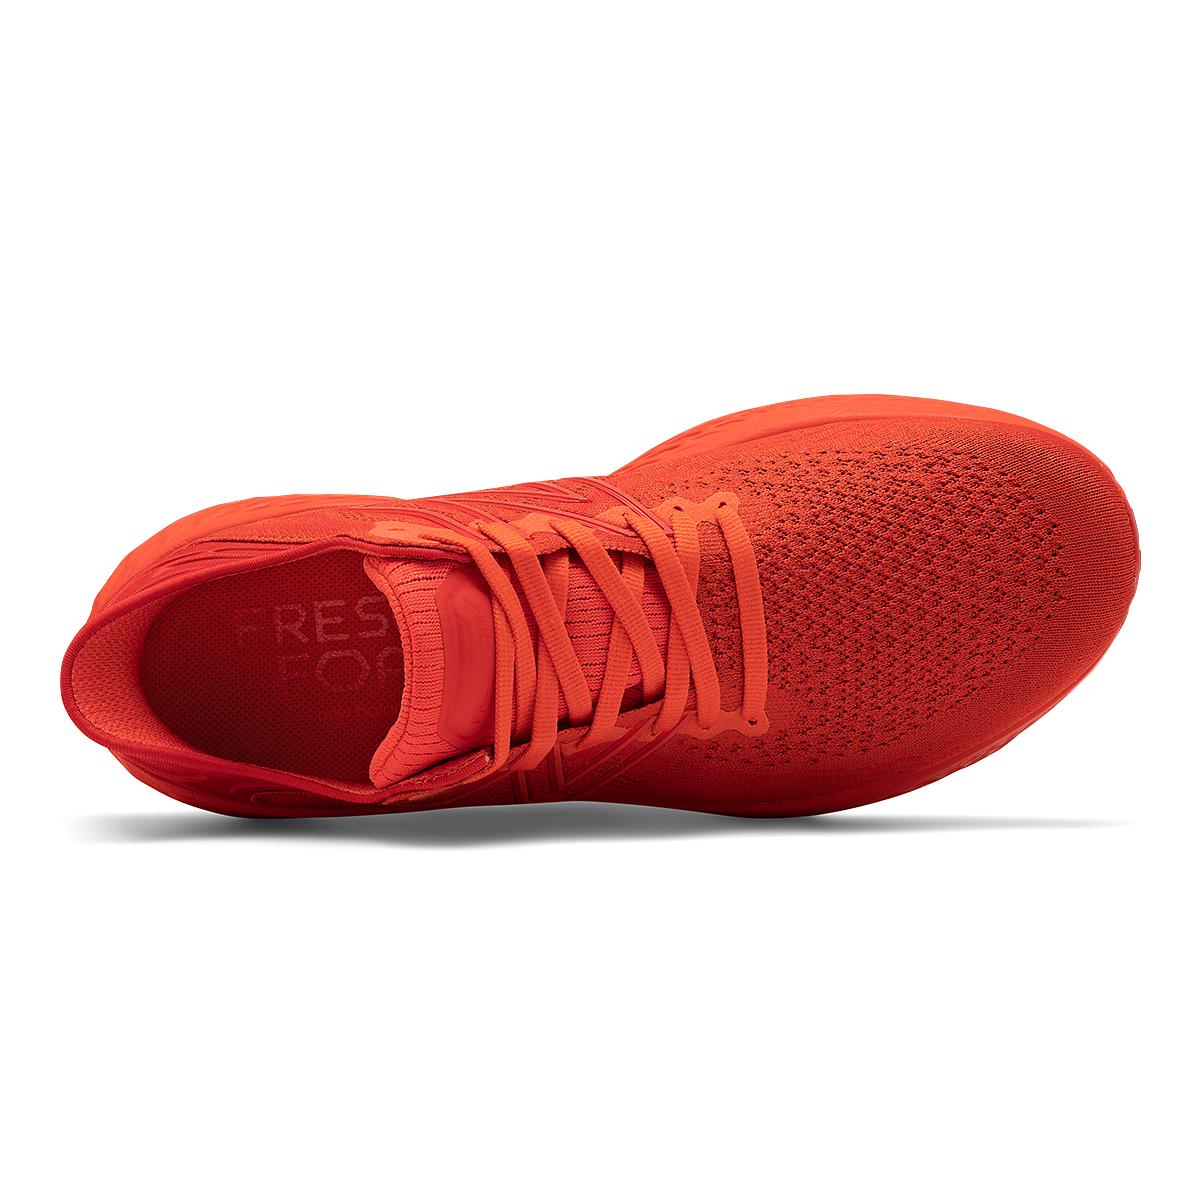 Men's New Balance Fresh Foam 1080V11 Running Shoe - Color: Ghost Pepper/Velocity Red - Size: 6 - Width: Wide, Ghost Pepper/Velocity Red, large, image 4